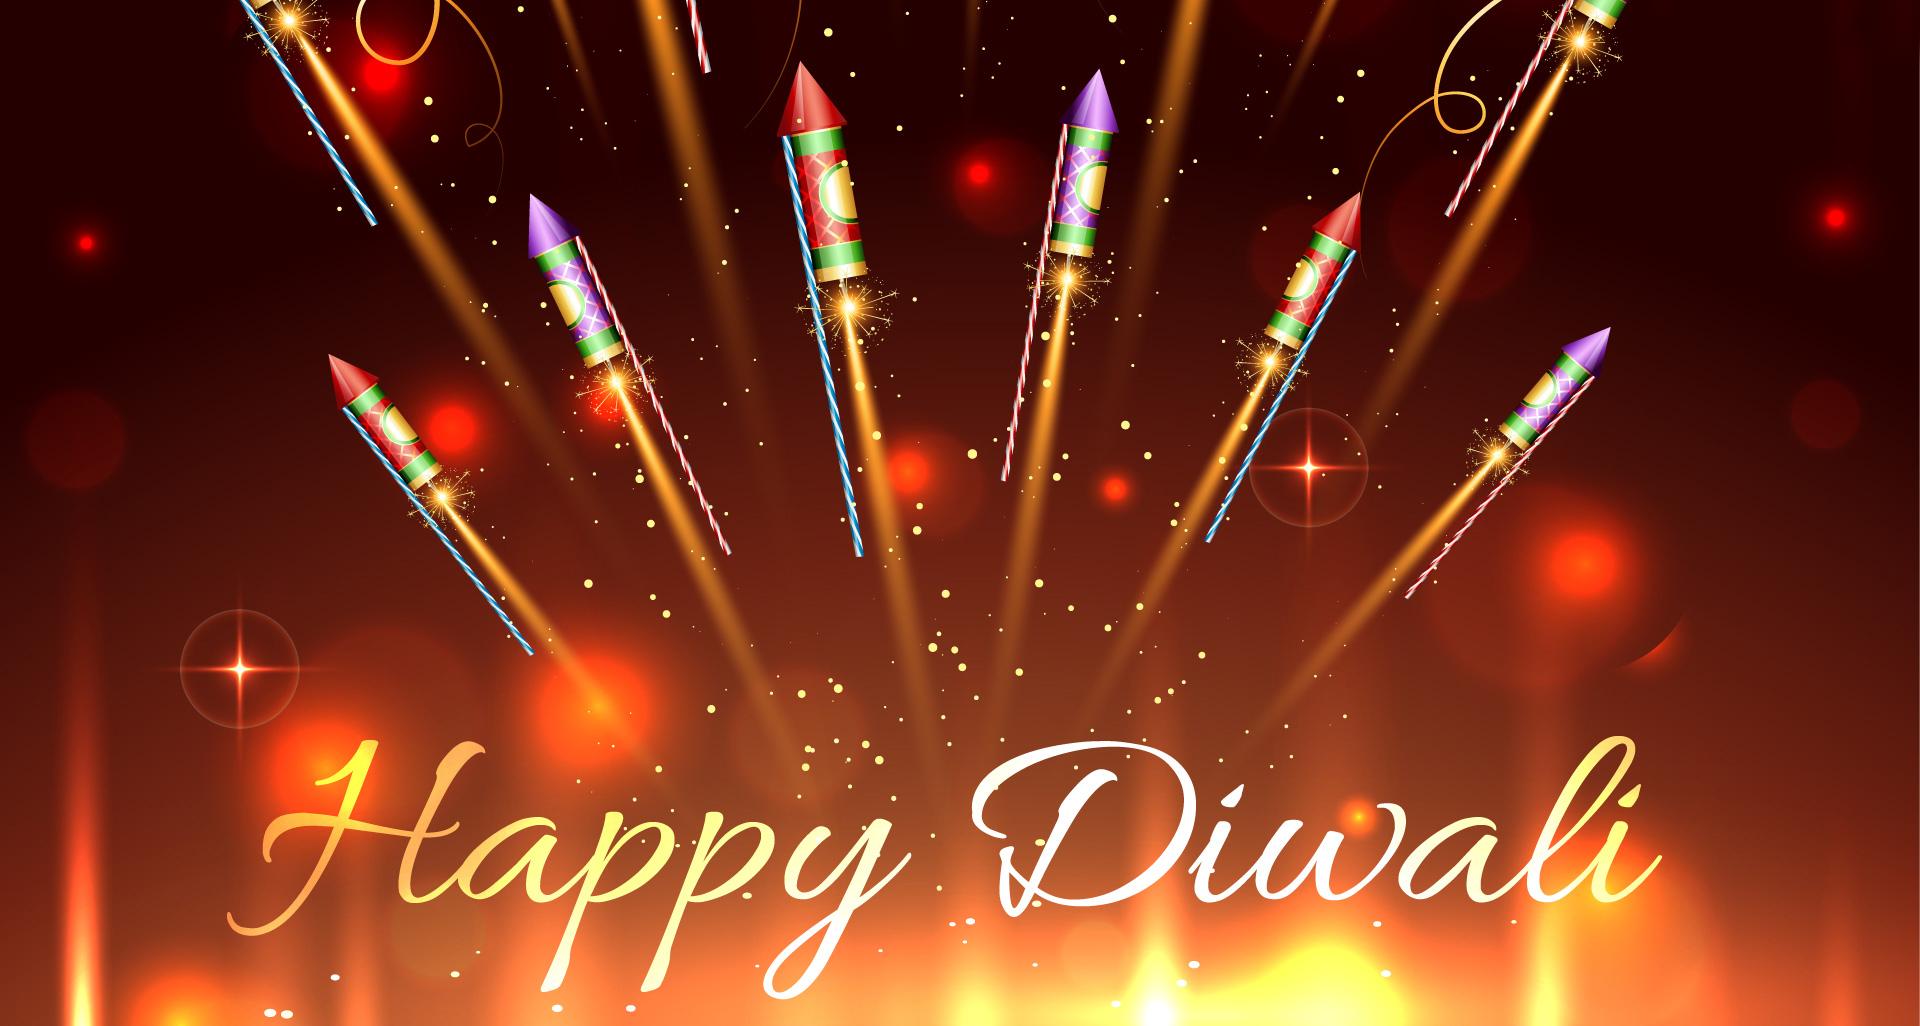 Choti Diwali HD Wallpapers Free Download